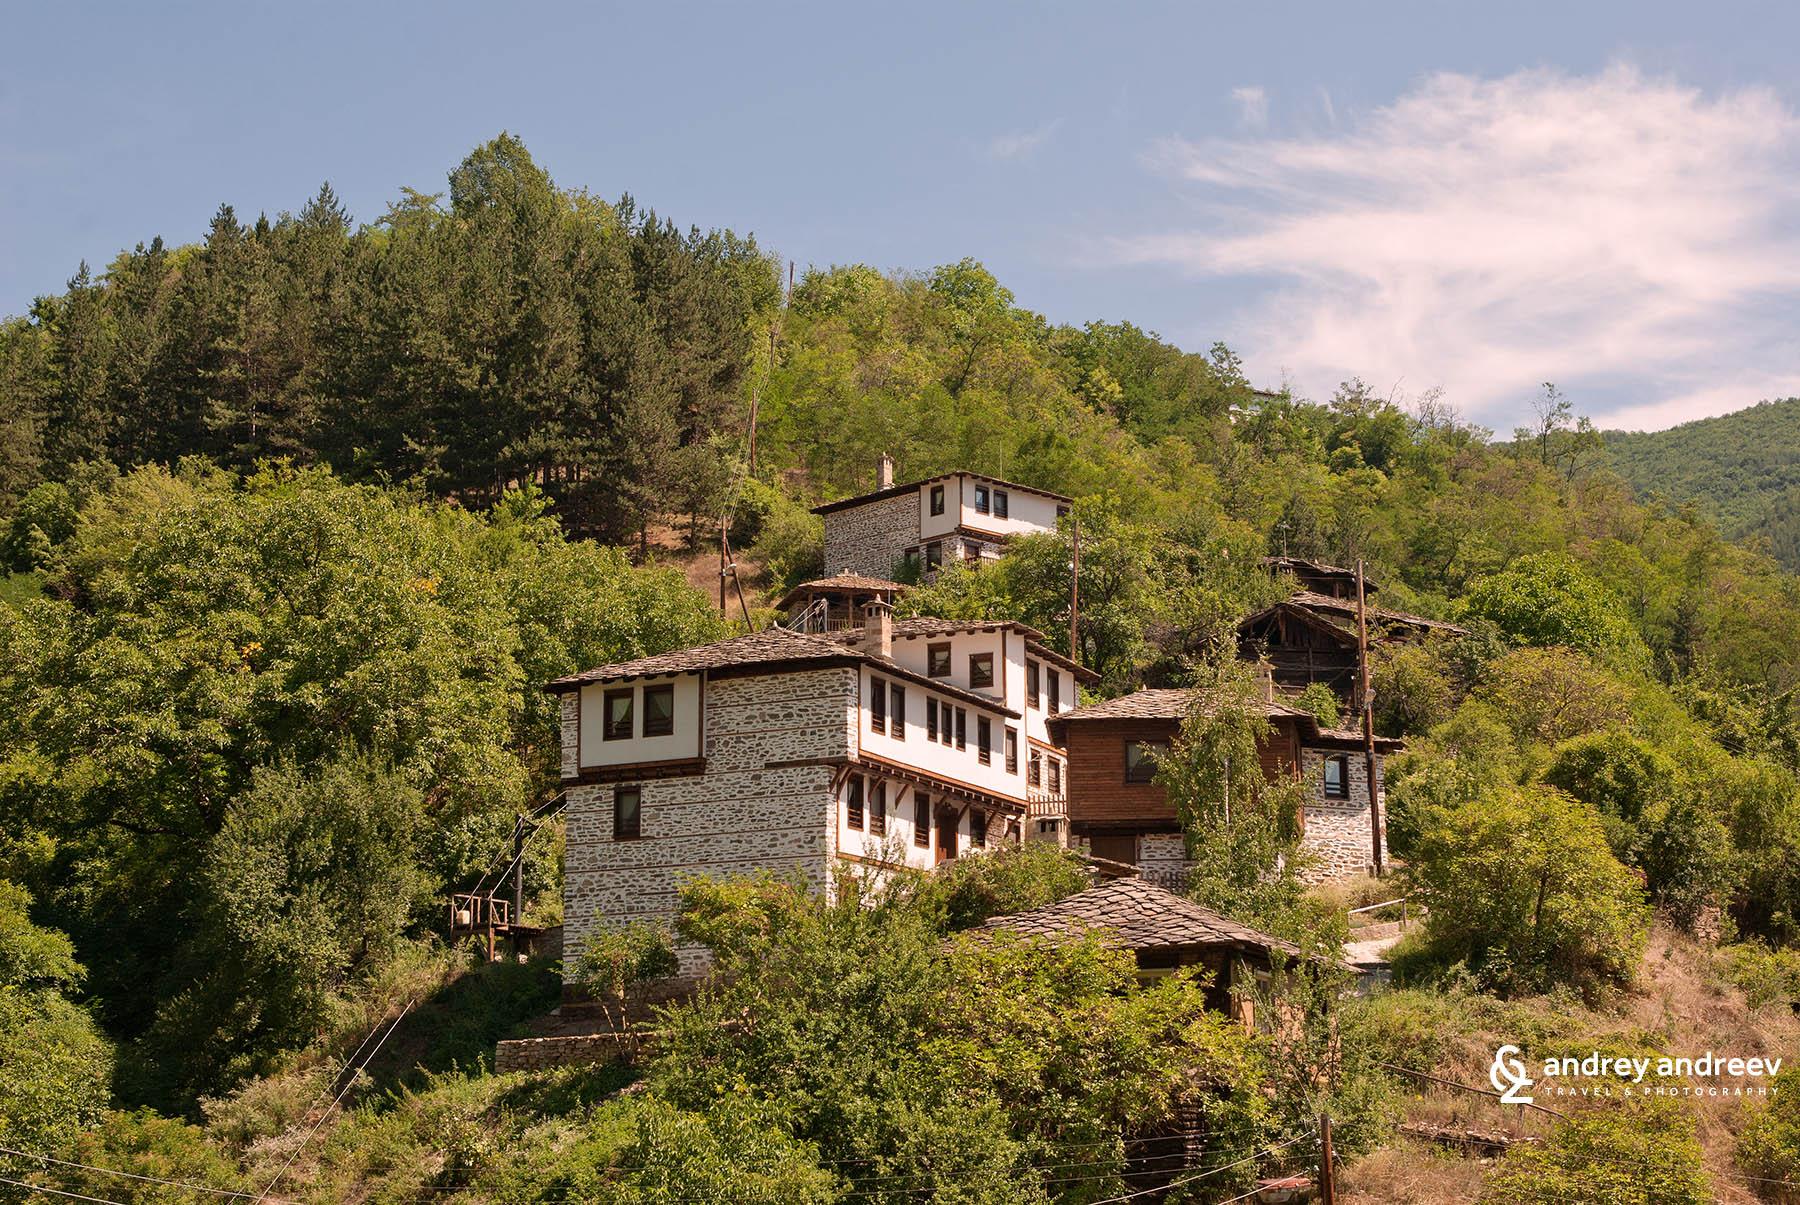 Село Косово / Kosovo village